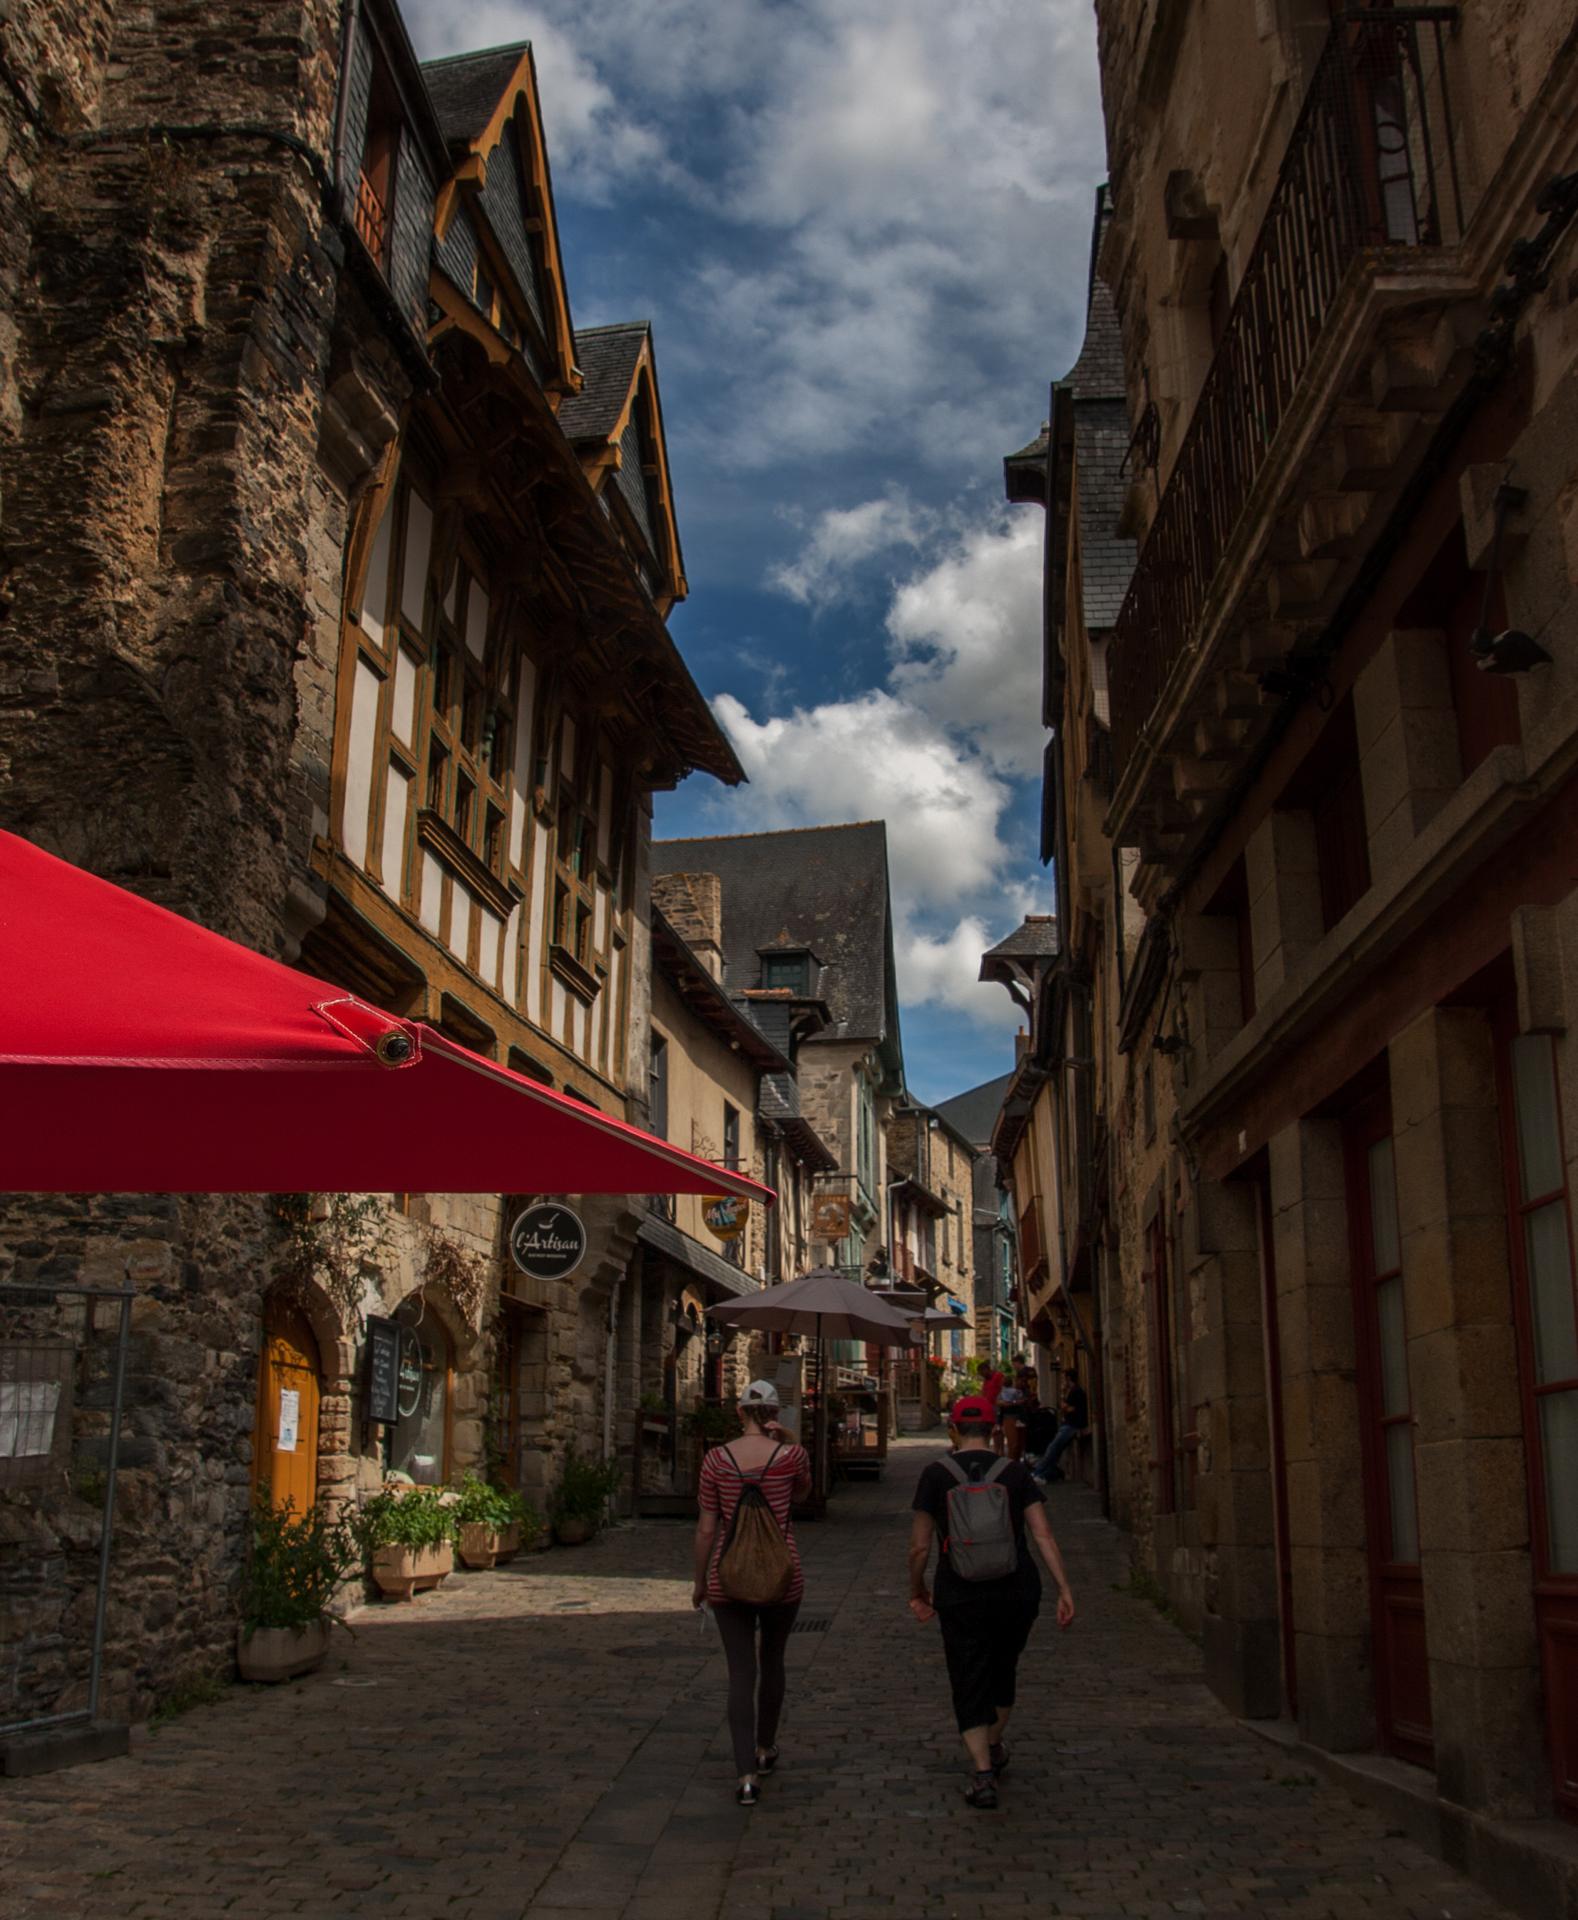 rue médiévale vitre